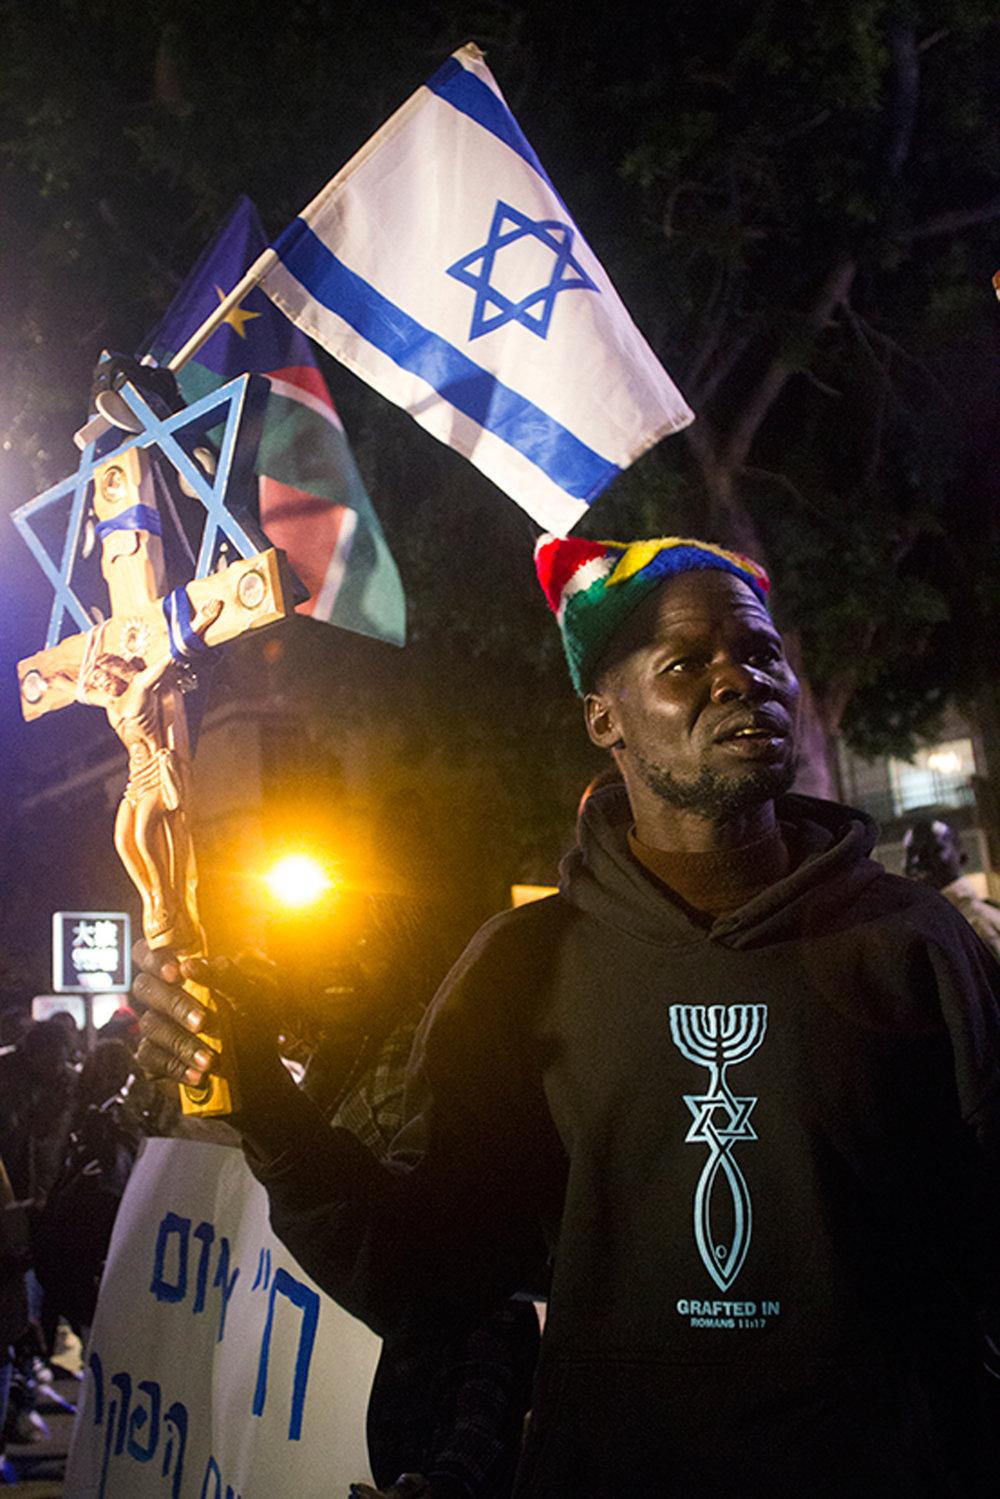 Sudanese Deportation Protest - Tel Aviv, Israel/Palestine